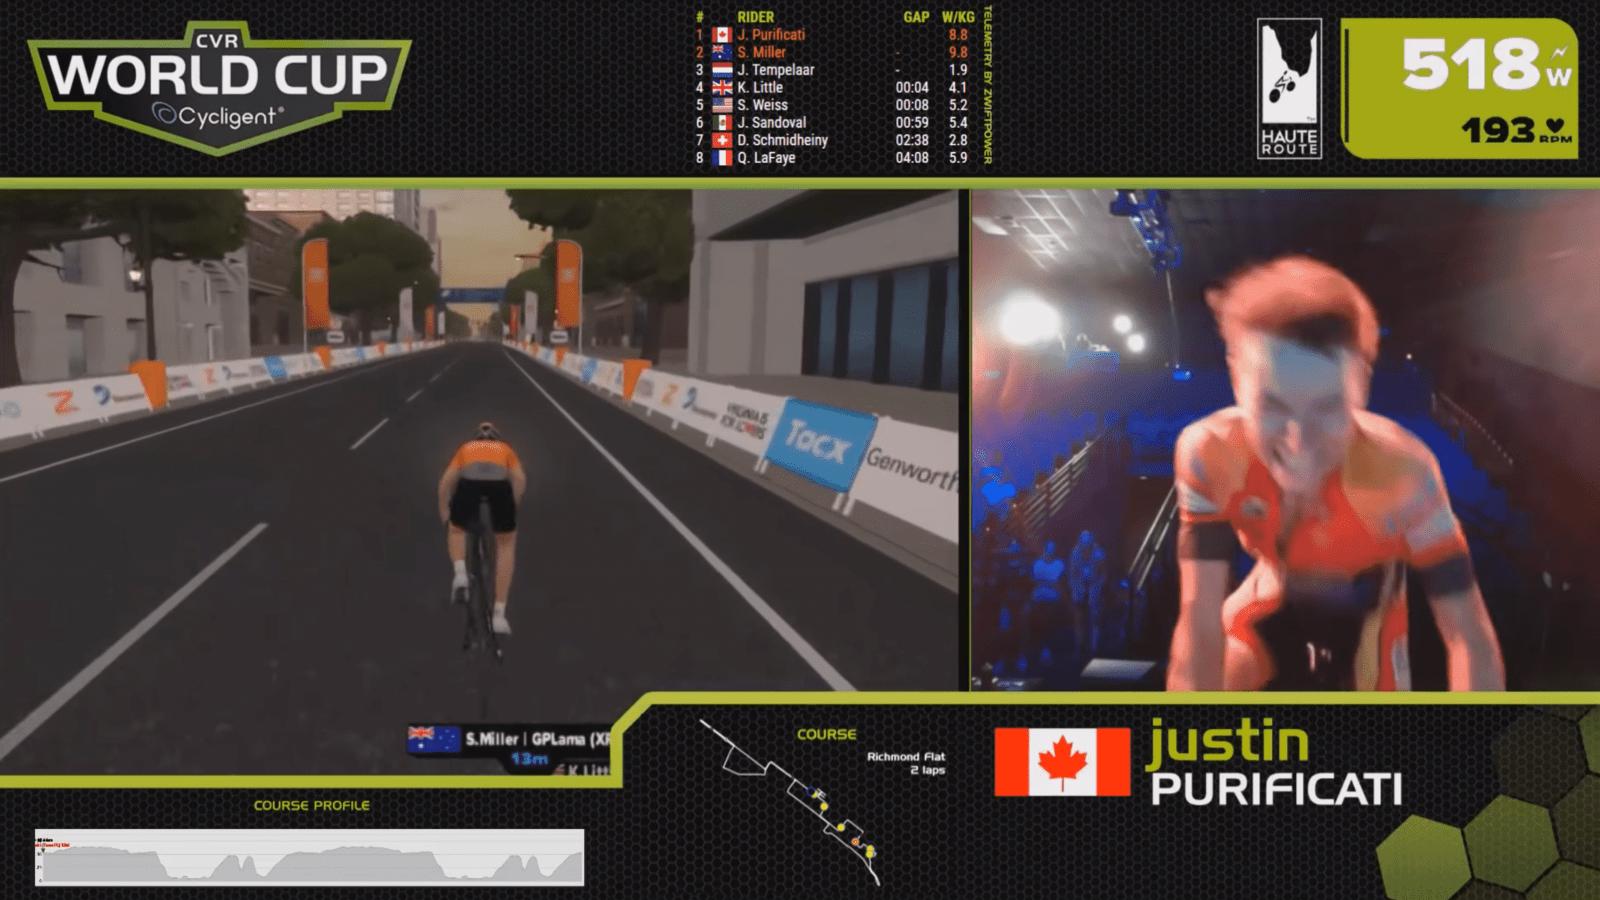 Justin CVR racing